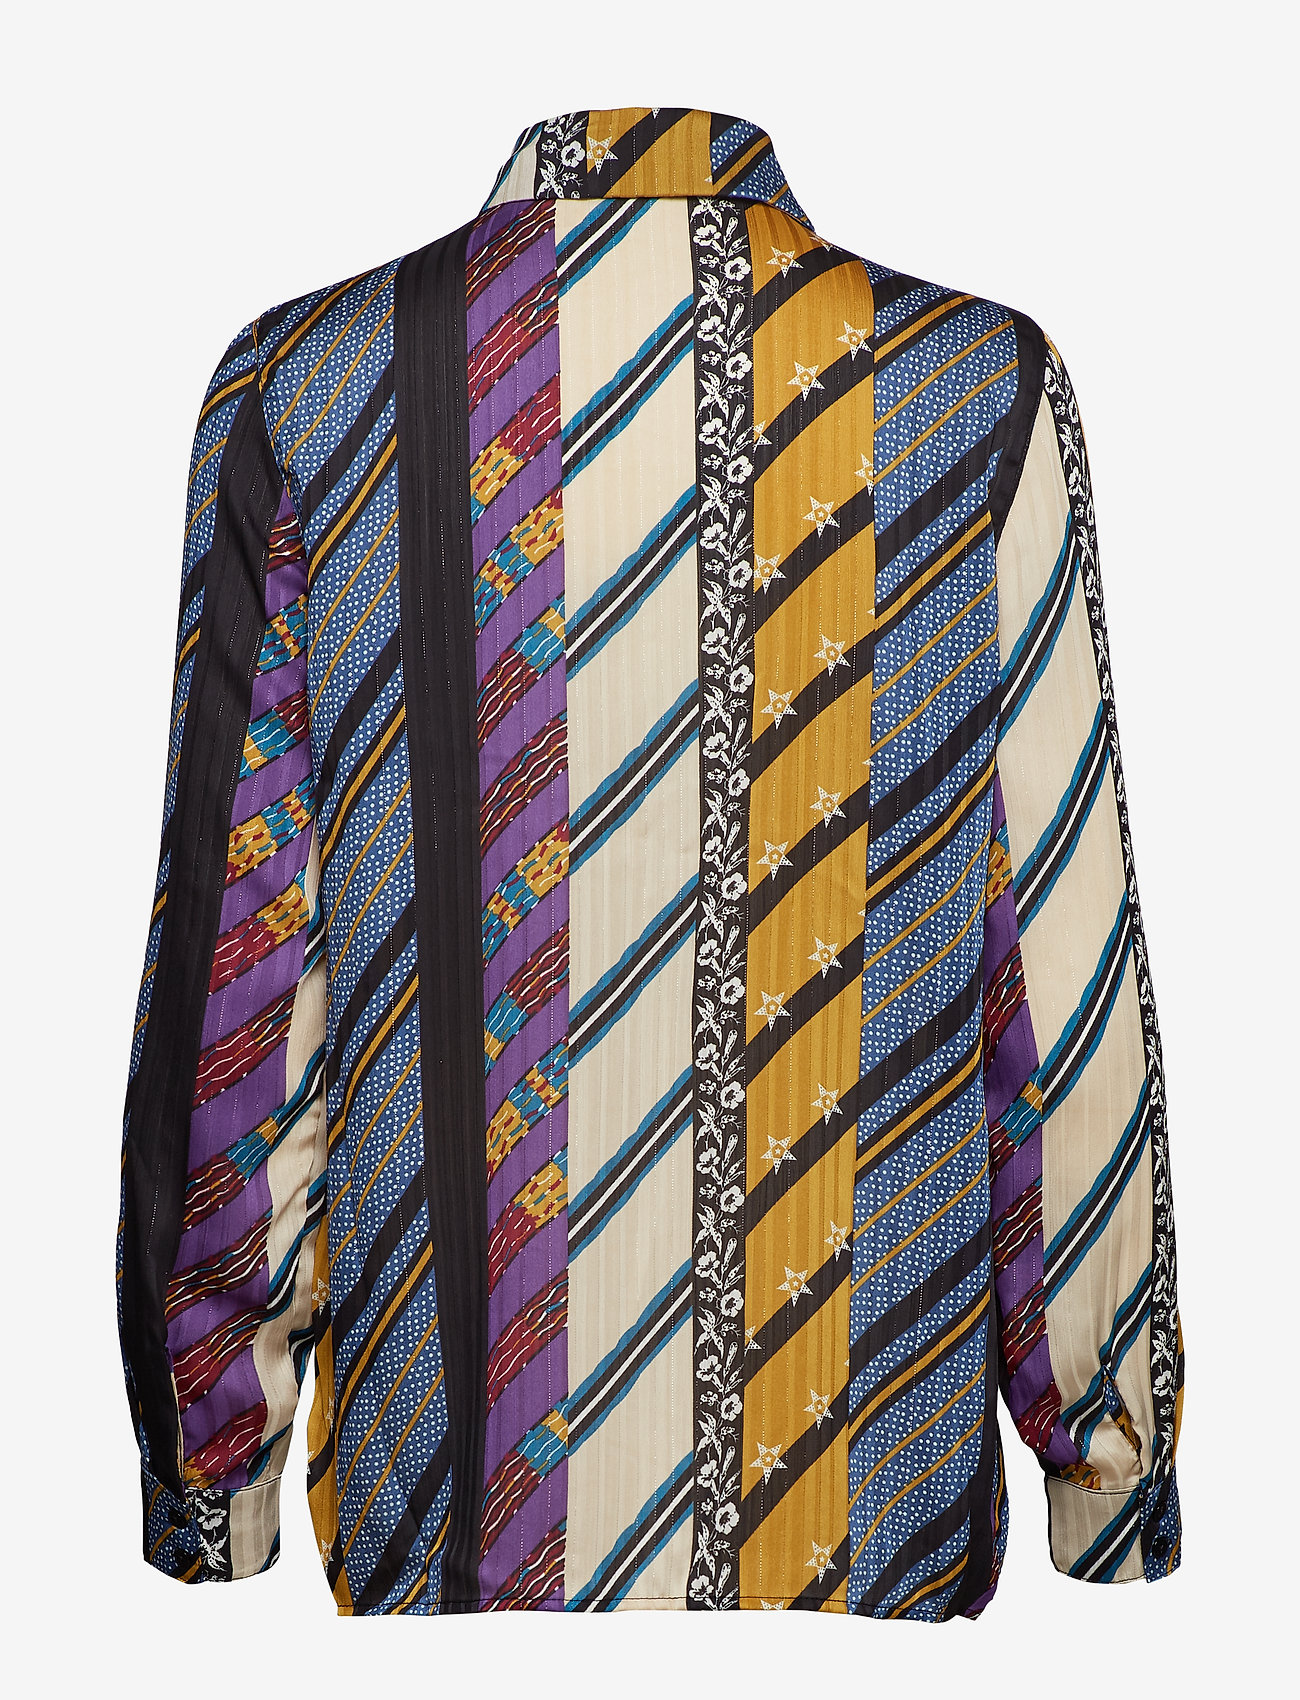 Kenzie Shirt (Patchwork Print) - Minus VozMwz